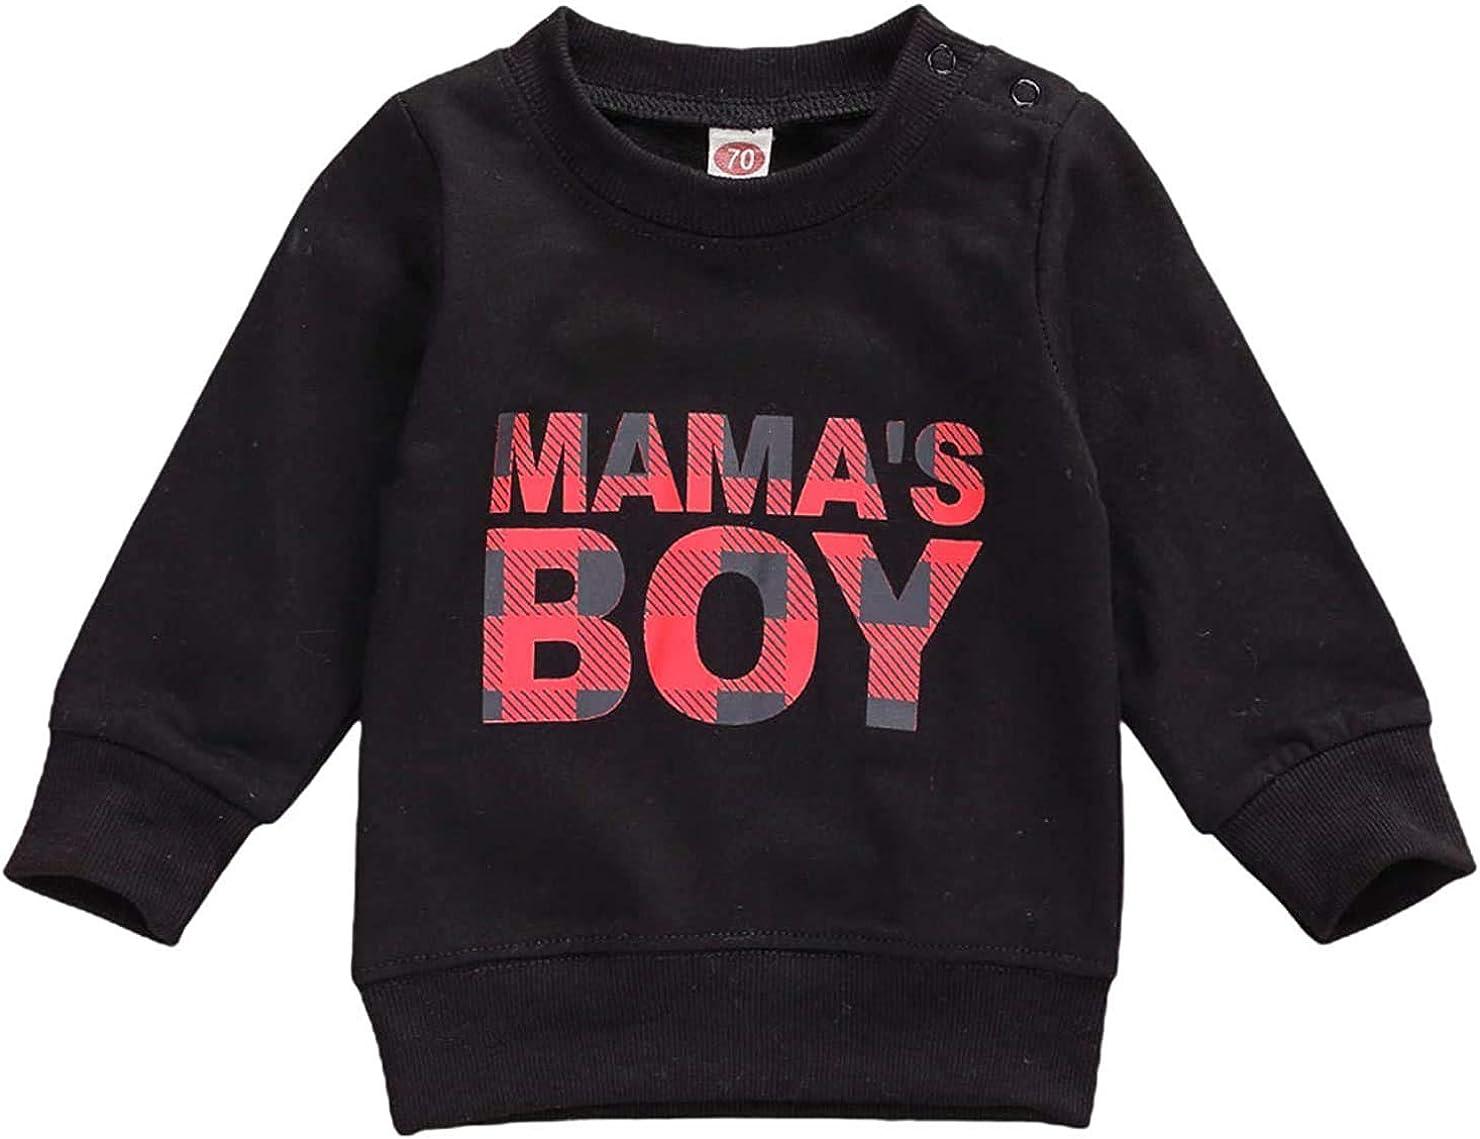 Ayalinggo Infant Toddler Baby Mamas BOY Long Sleeve Shirts Sweatshirts Casual Basic Top Fall Winter Outfit Clothes